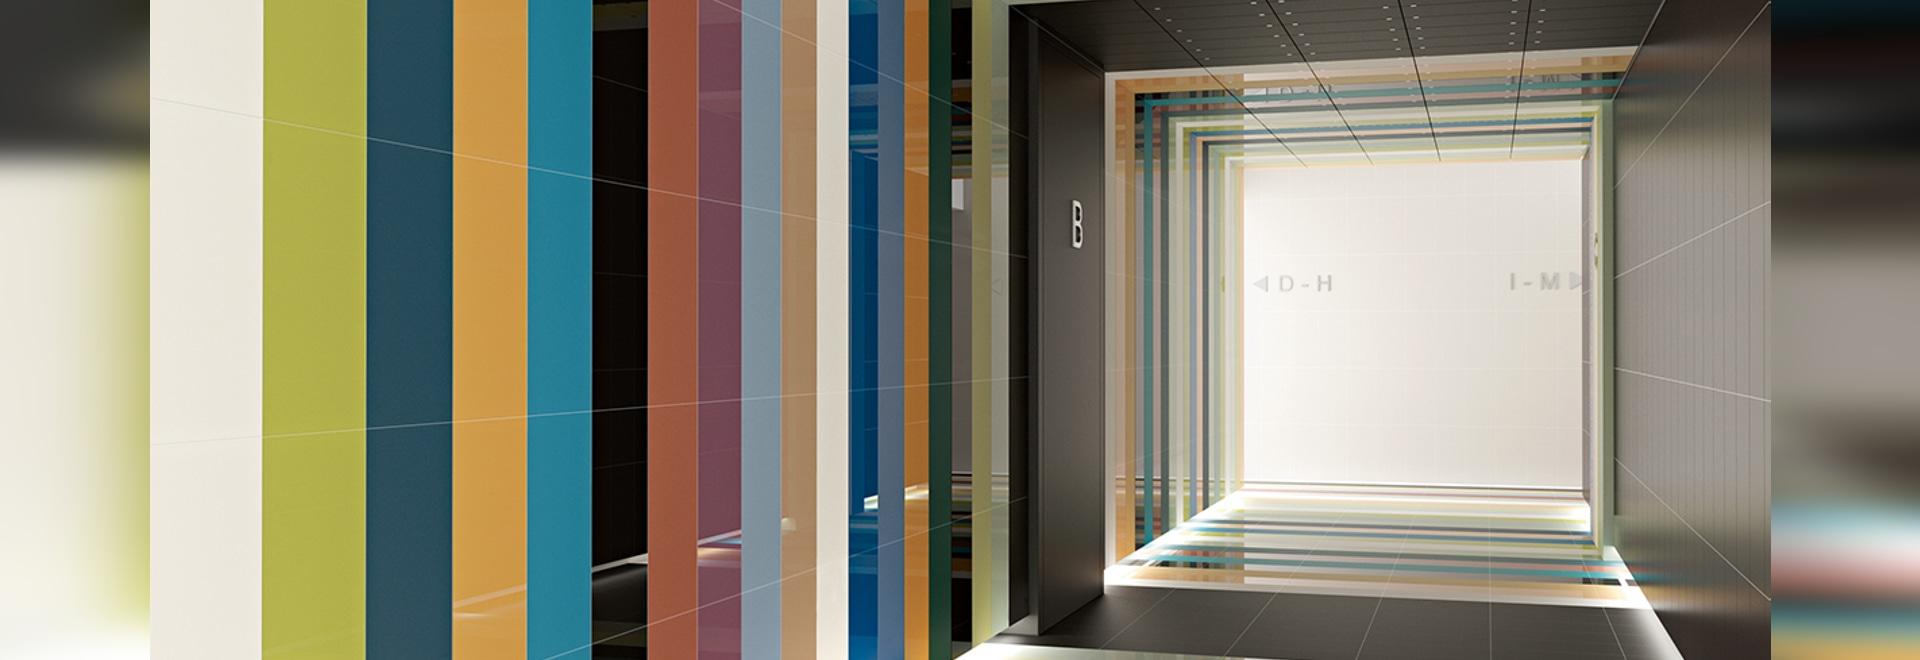 revigrÉs wins the german design award 2017 - 3750 agueda, portugal